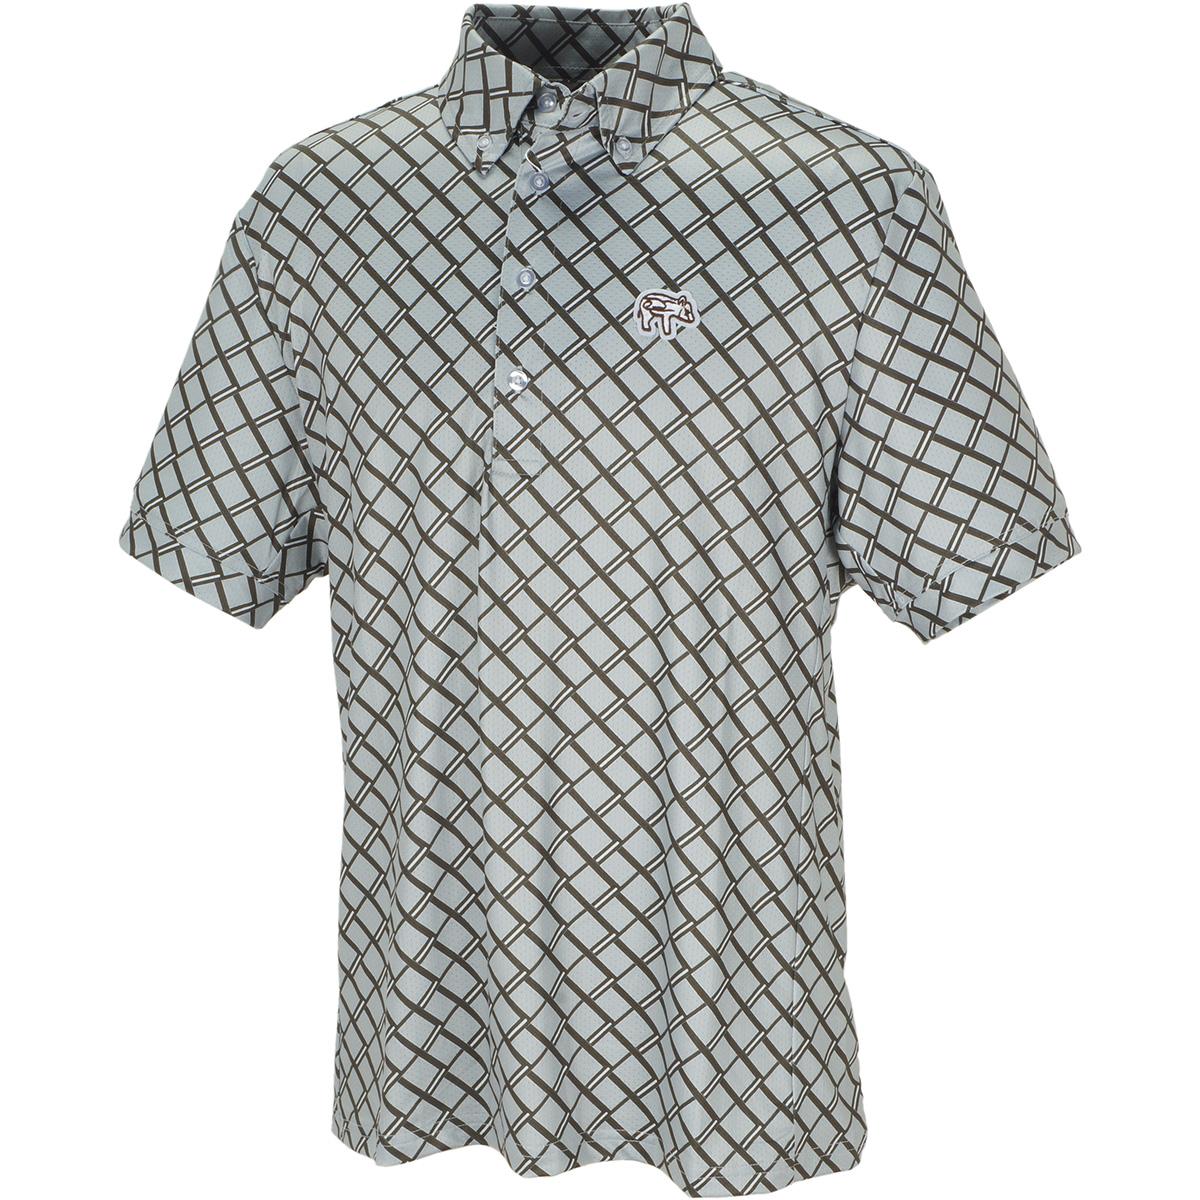 efficace homme ストレッチ 格子柄ボタンダウン半袖ポロシャツ